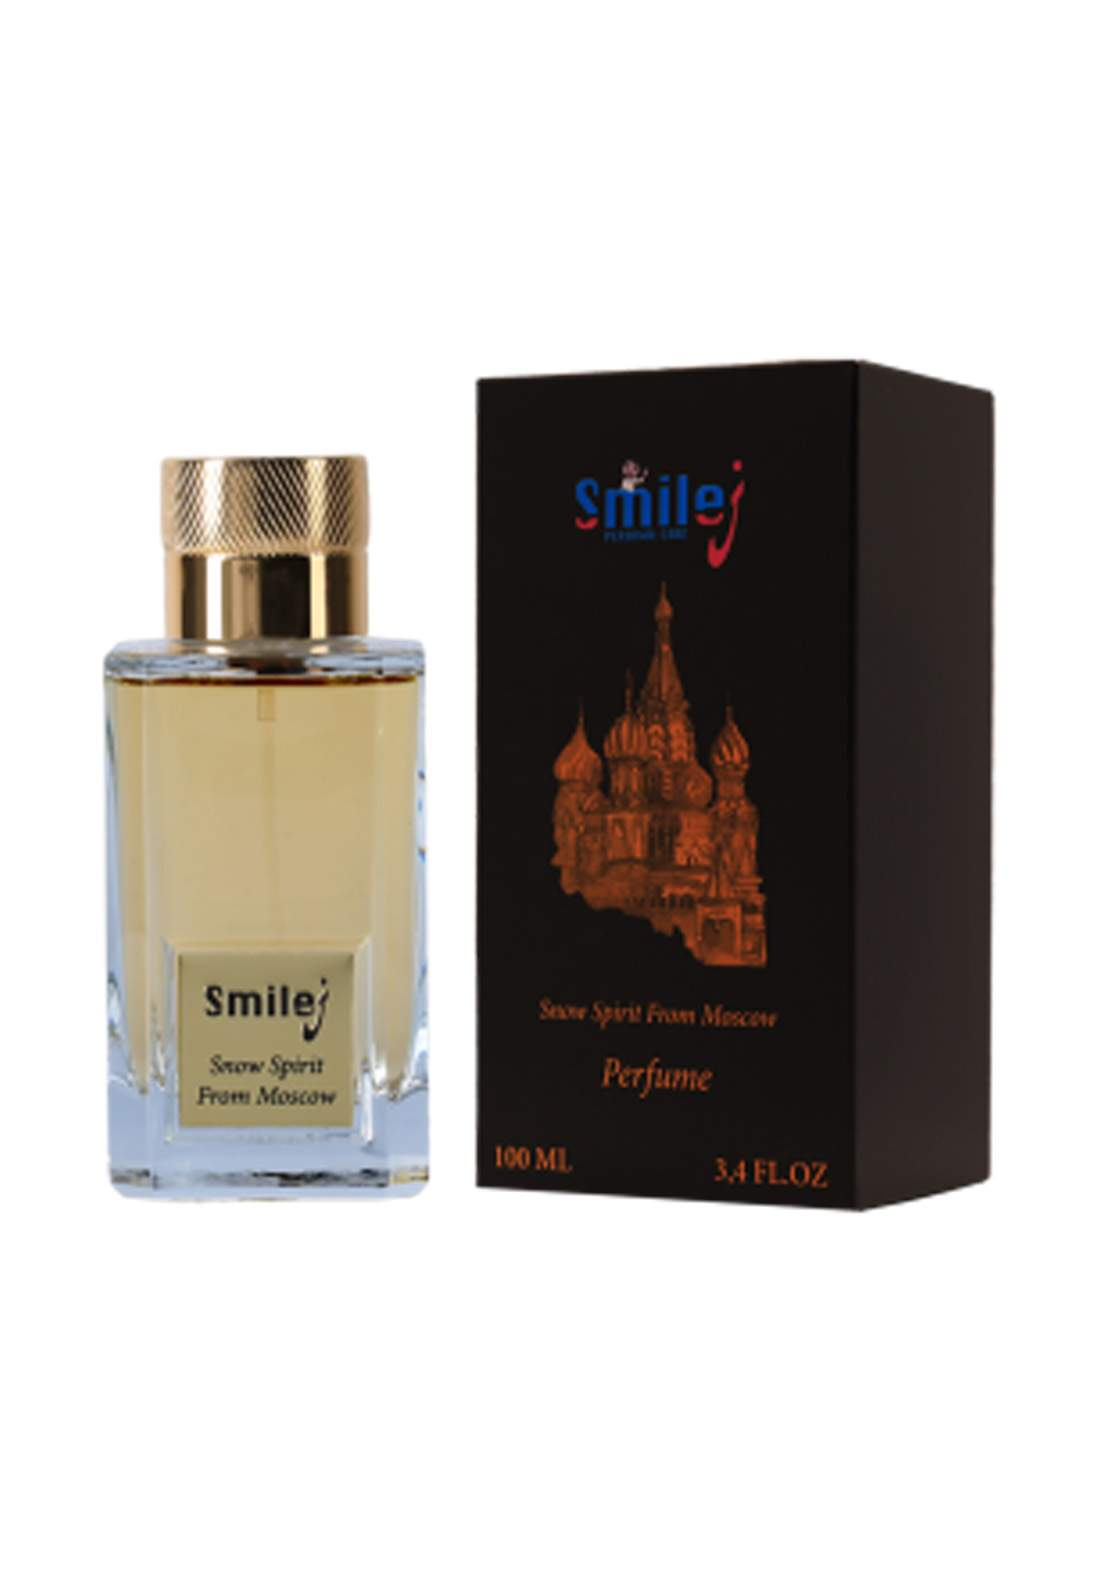 Smilej Perfume Snow Spirit From Moscow 100ml عطر رجالي